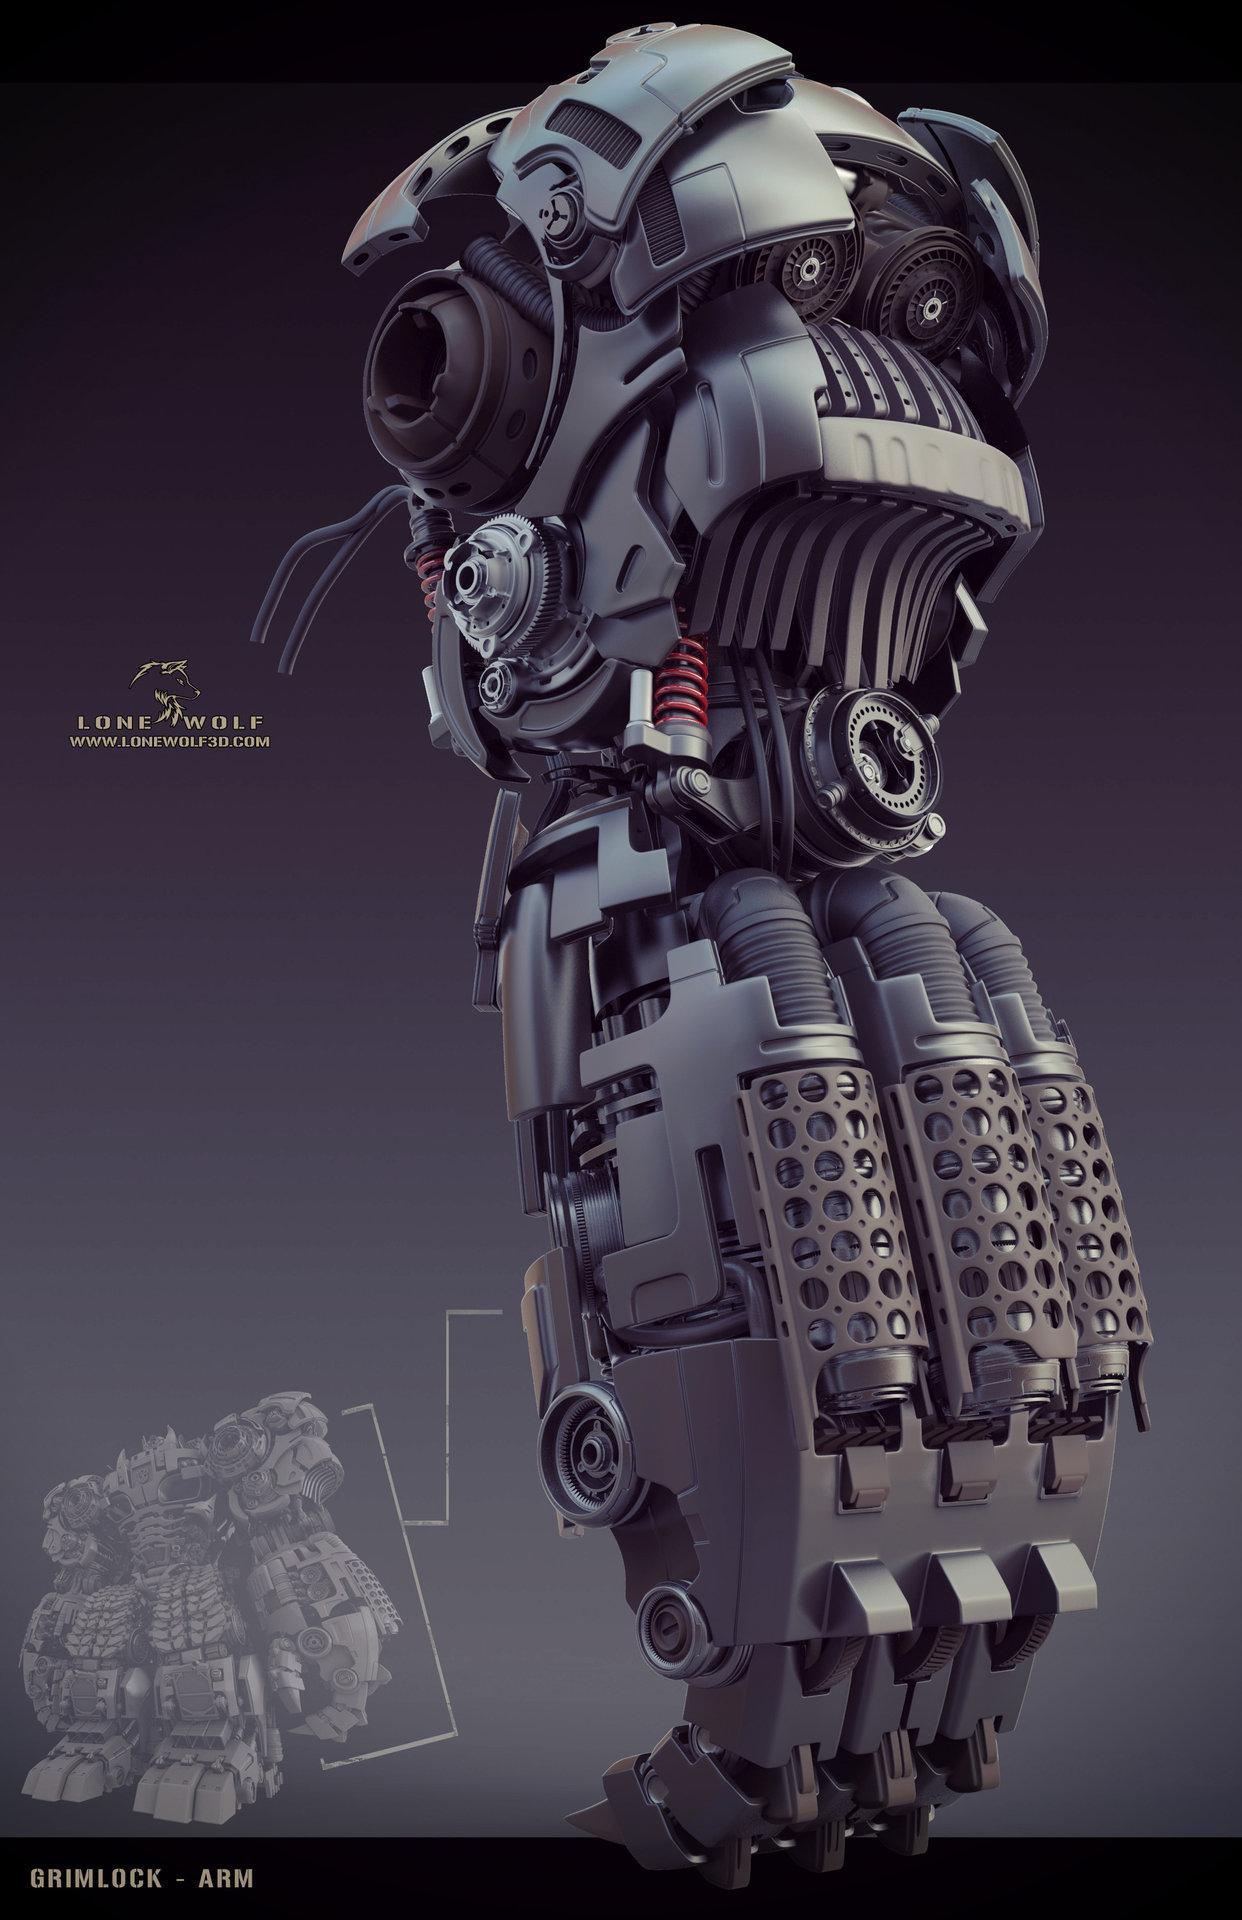 Grimlock arm 02cghub